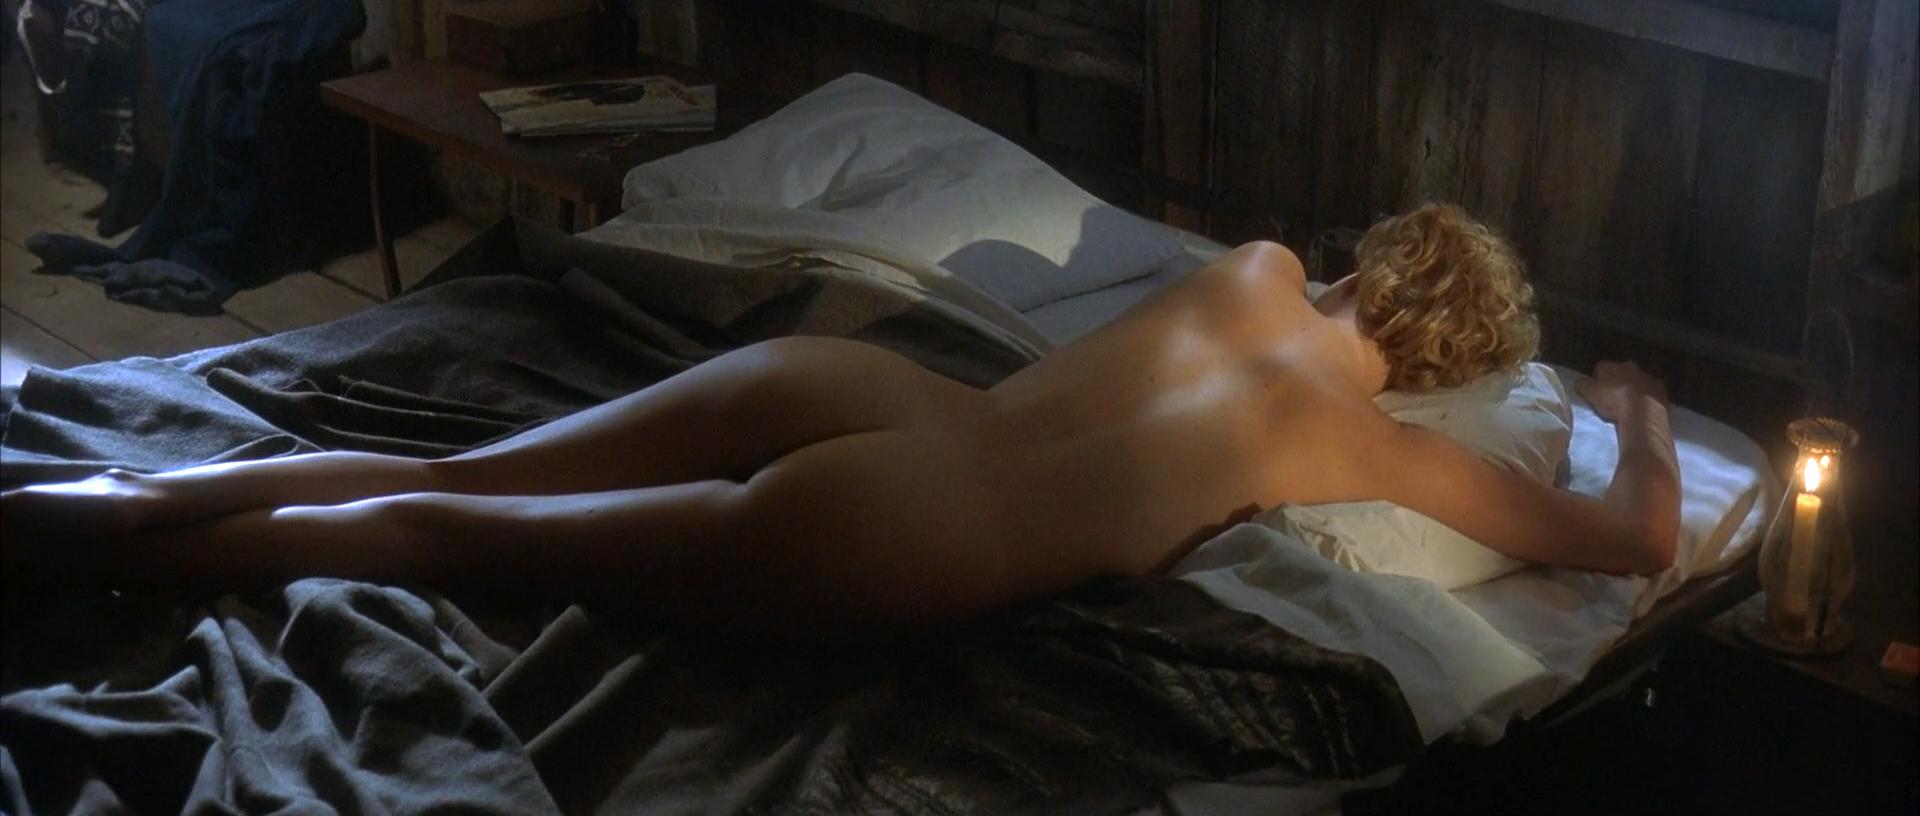 Deeksha serh nude photographs